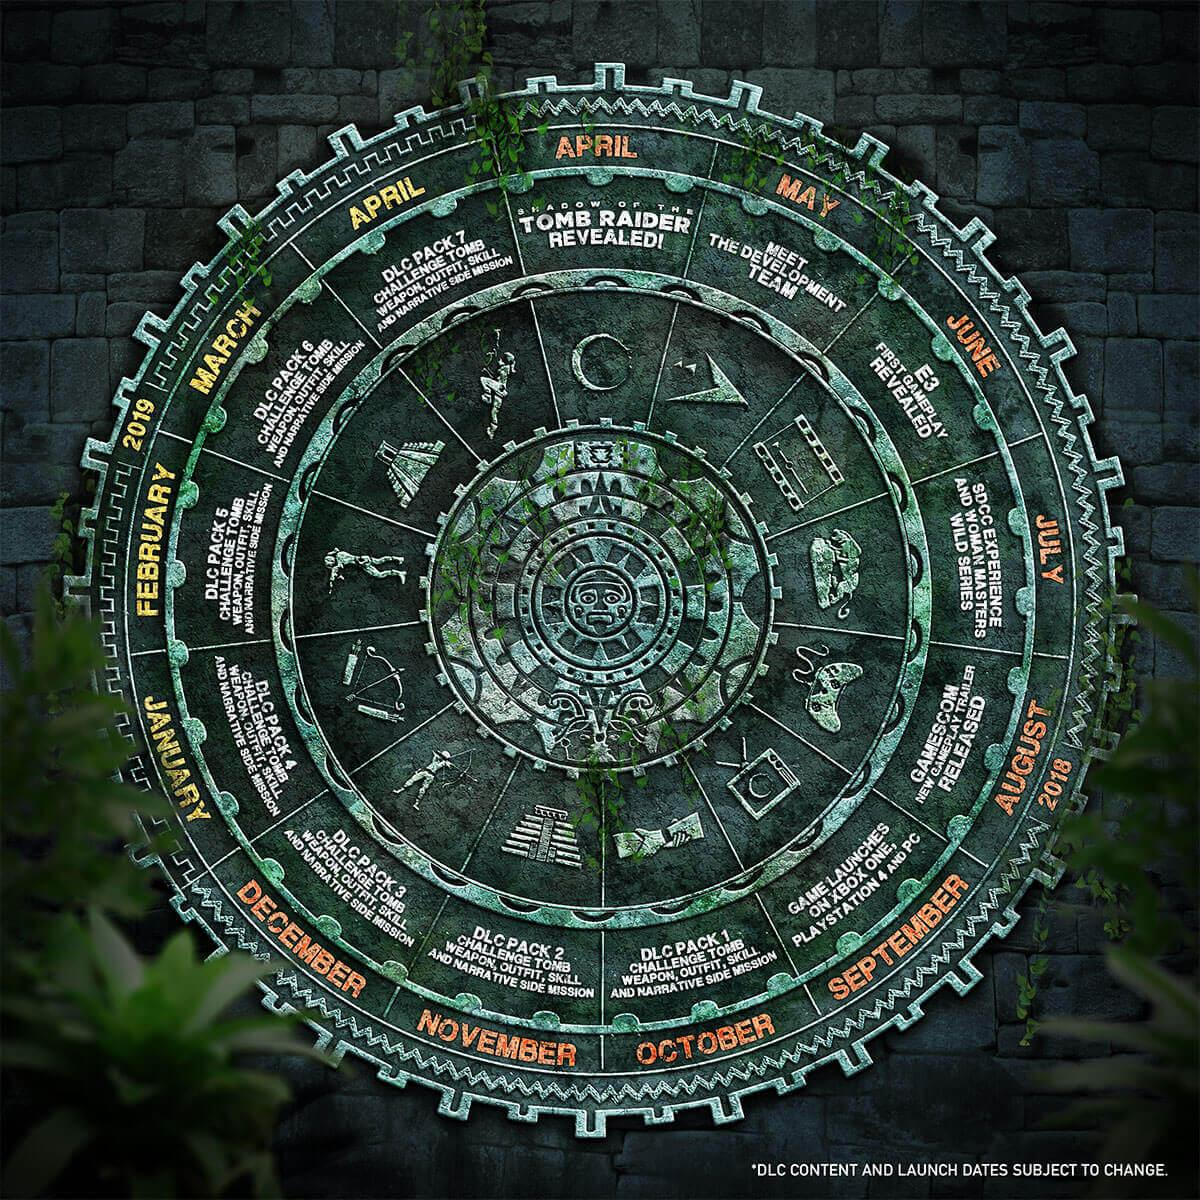 Shadow of the Tomb Raider - календарь предстоящих событий игры